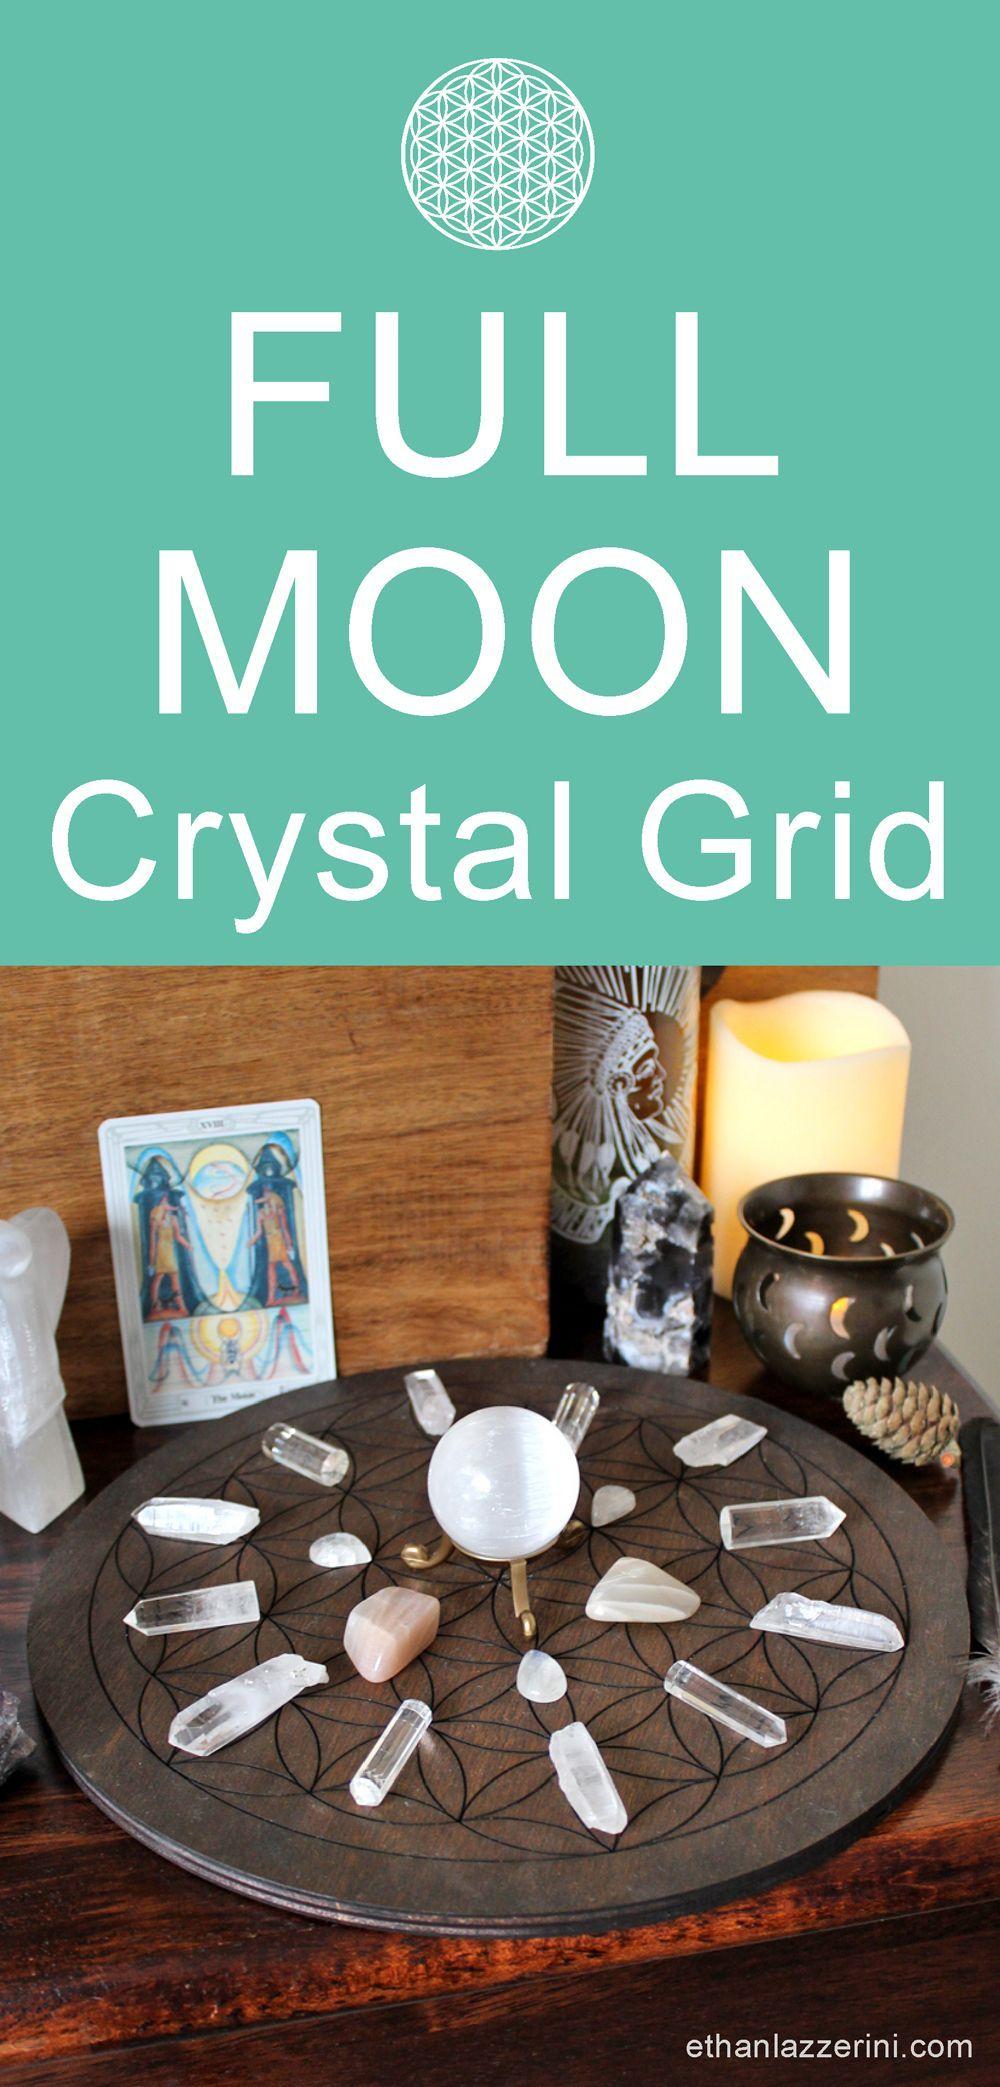 Full Moon Crystal Grid plus Gratitude Ritual #newmoonritual Full Moon Crystal Grid - Full Moon gratitude ritual with Moonstone #newmoonritual